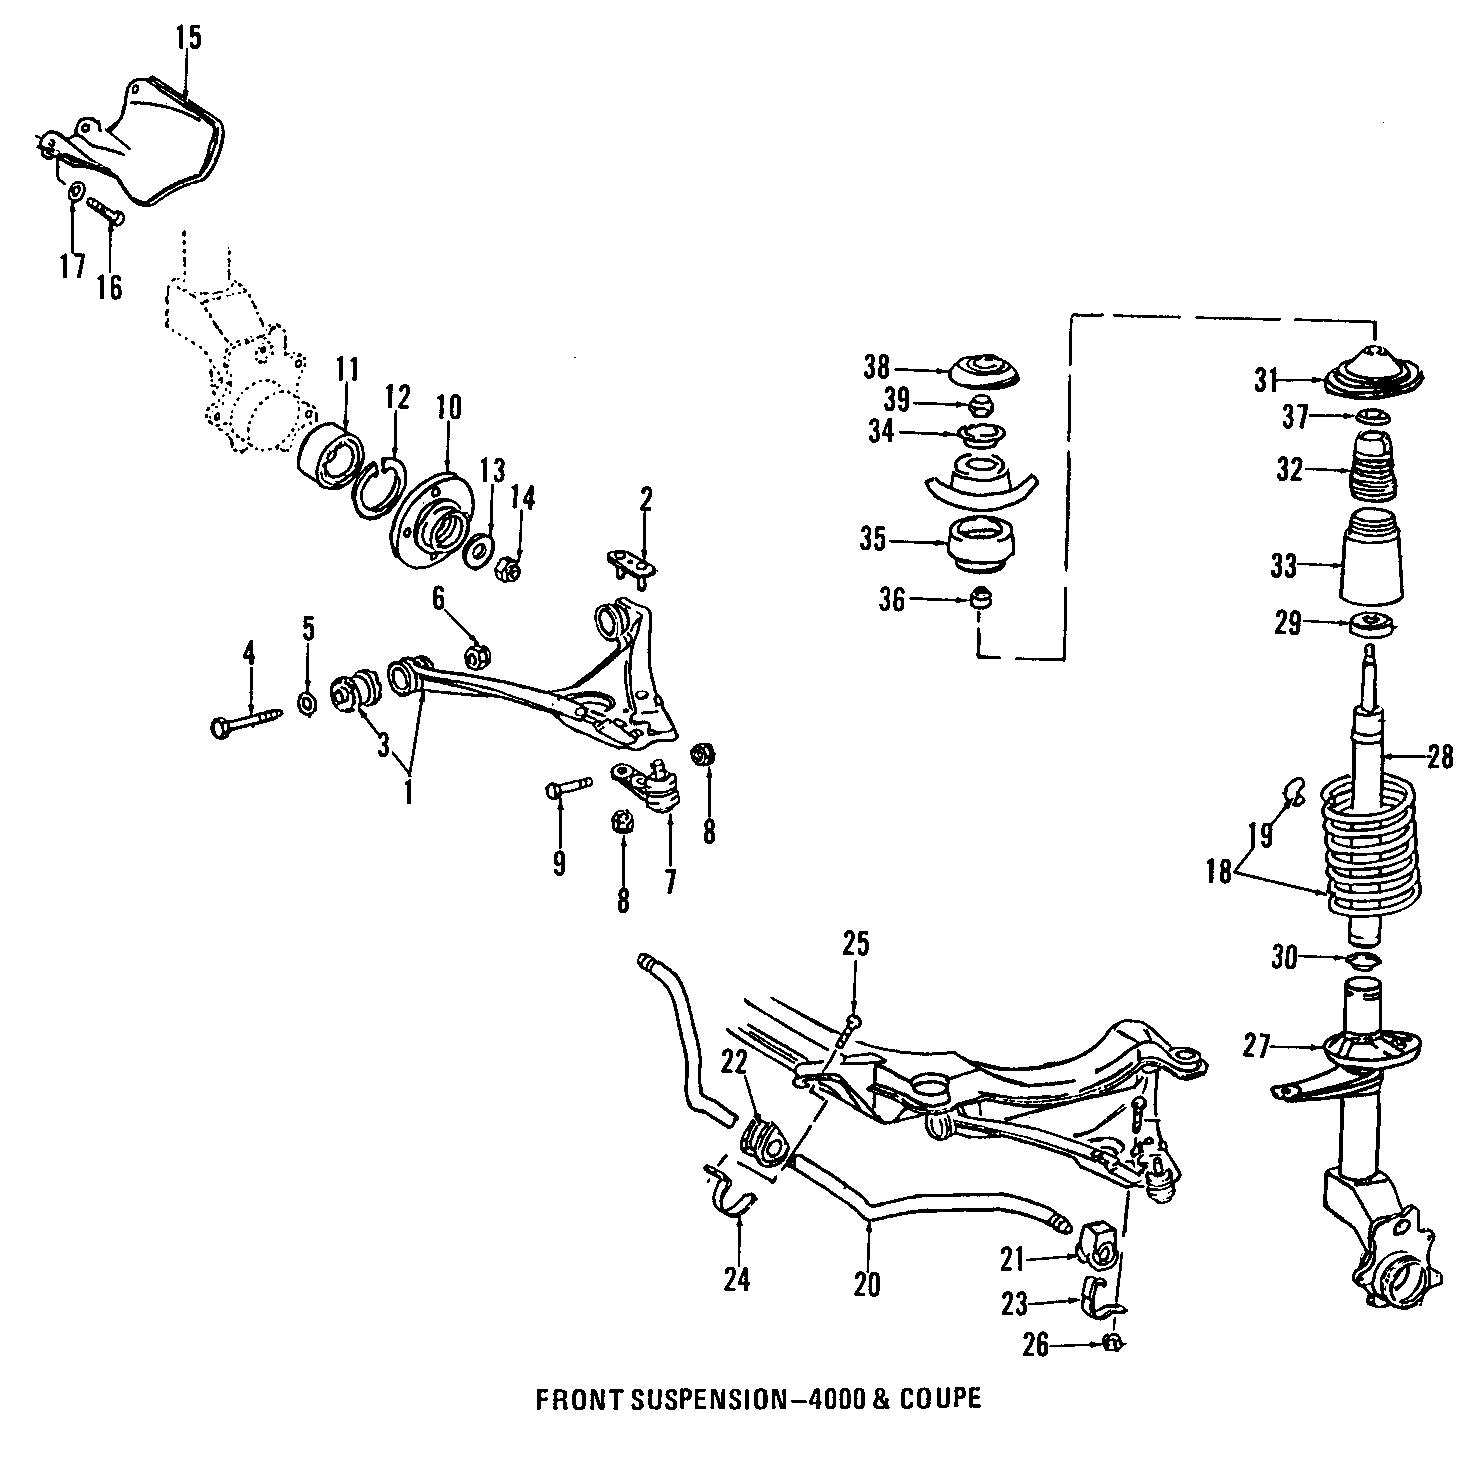 Audi Arm Control Bushing Mount Suspension